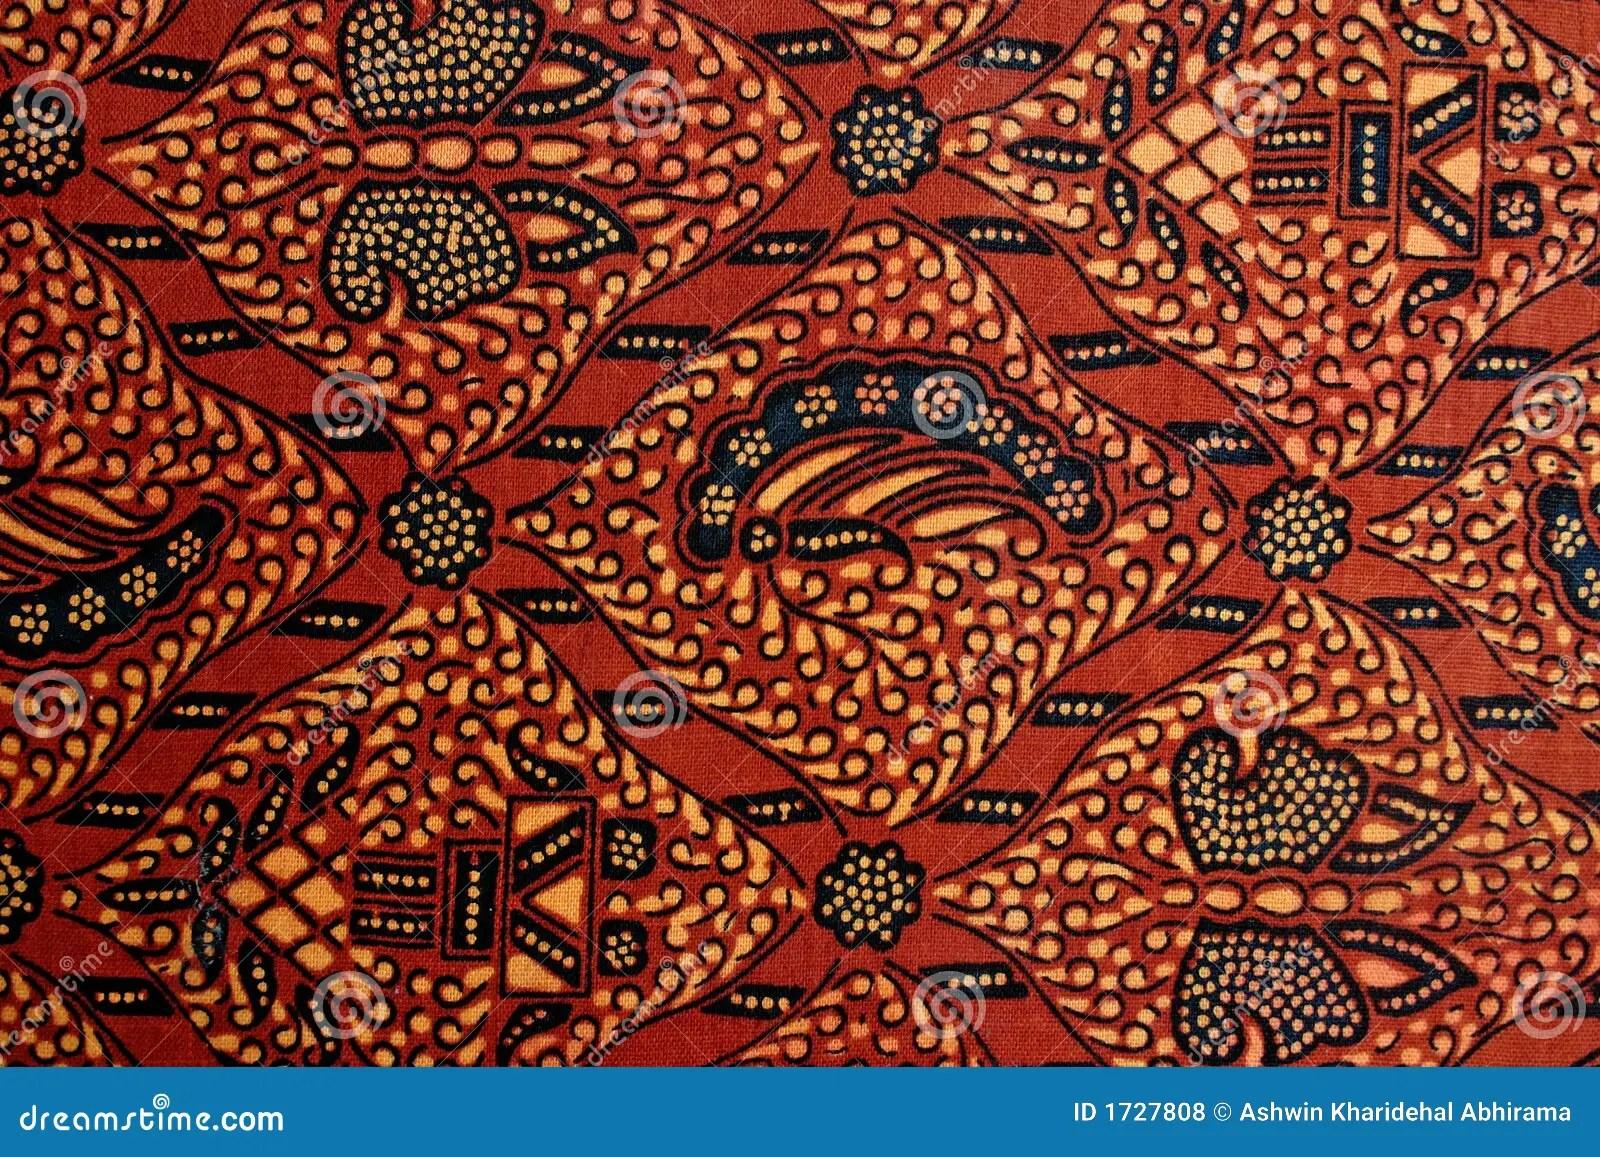 Batik Design Royalty Free Stock Photos  Image 1727808